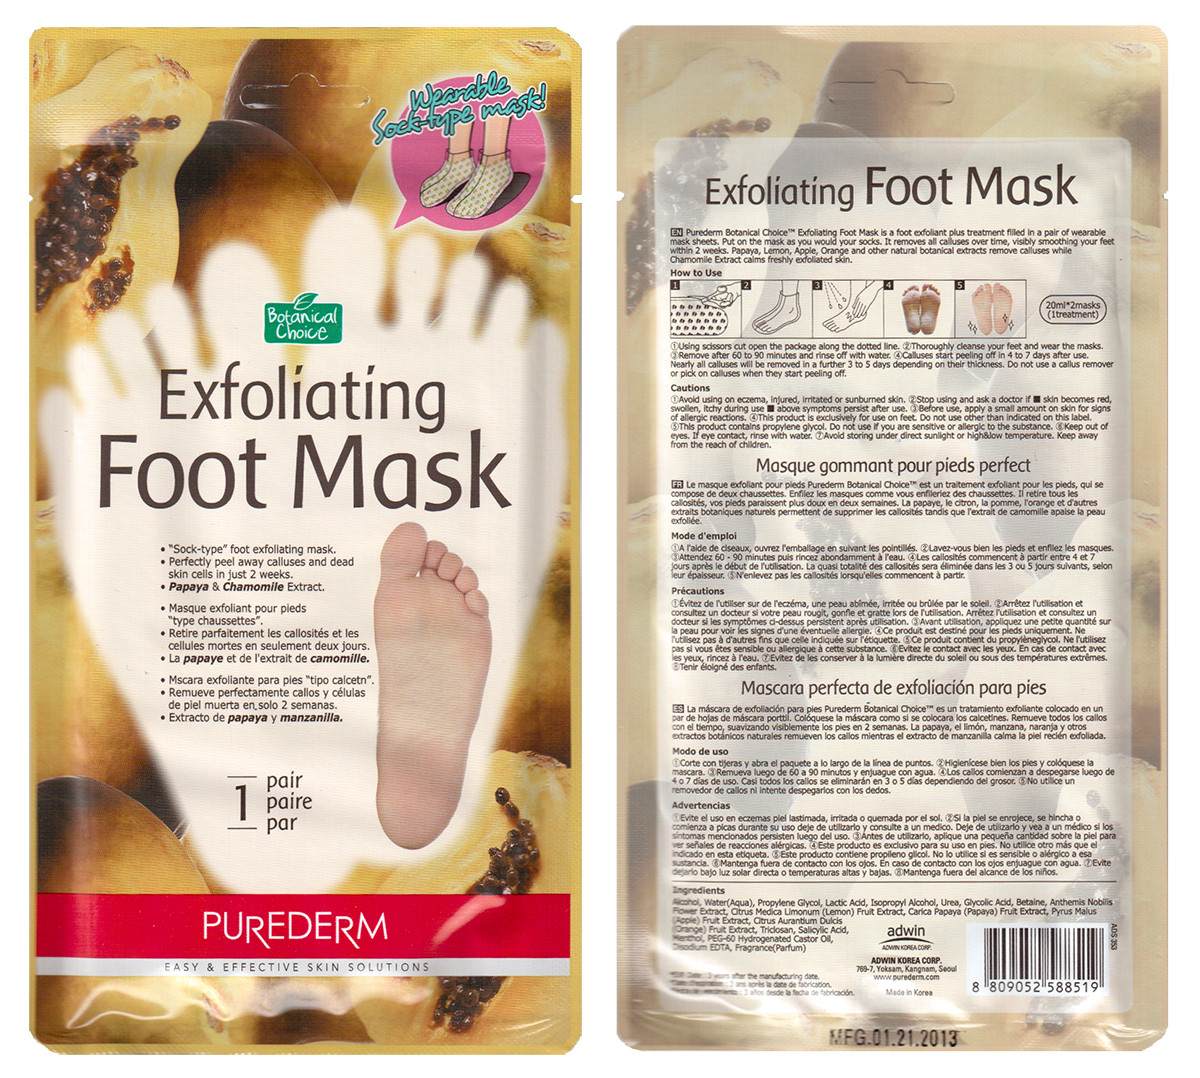 Purederm Exfoliating Foot Mask Пилинг для ног